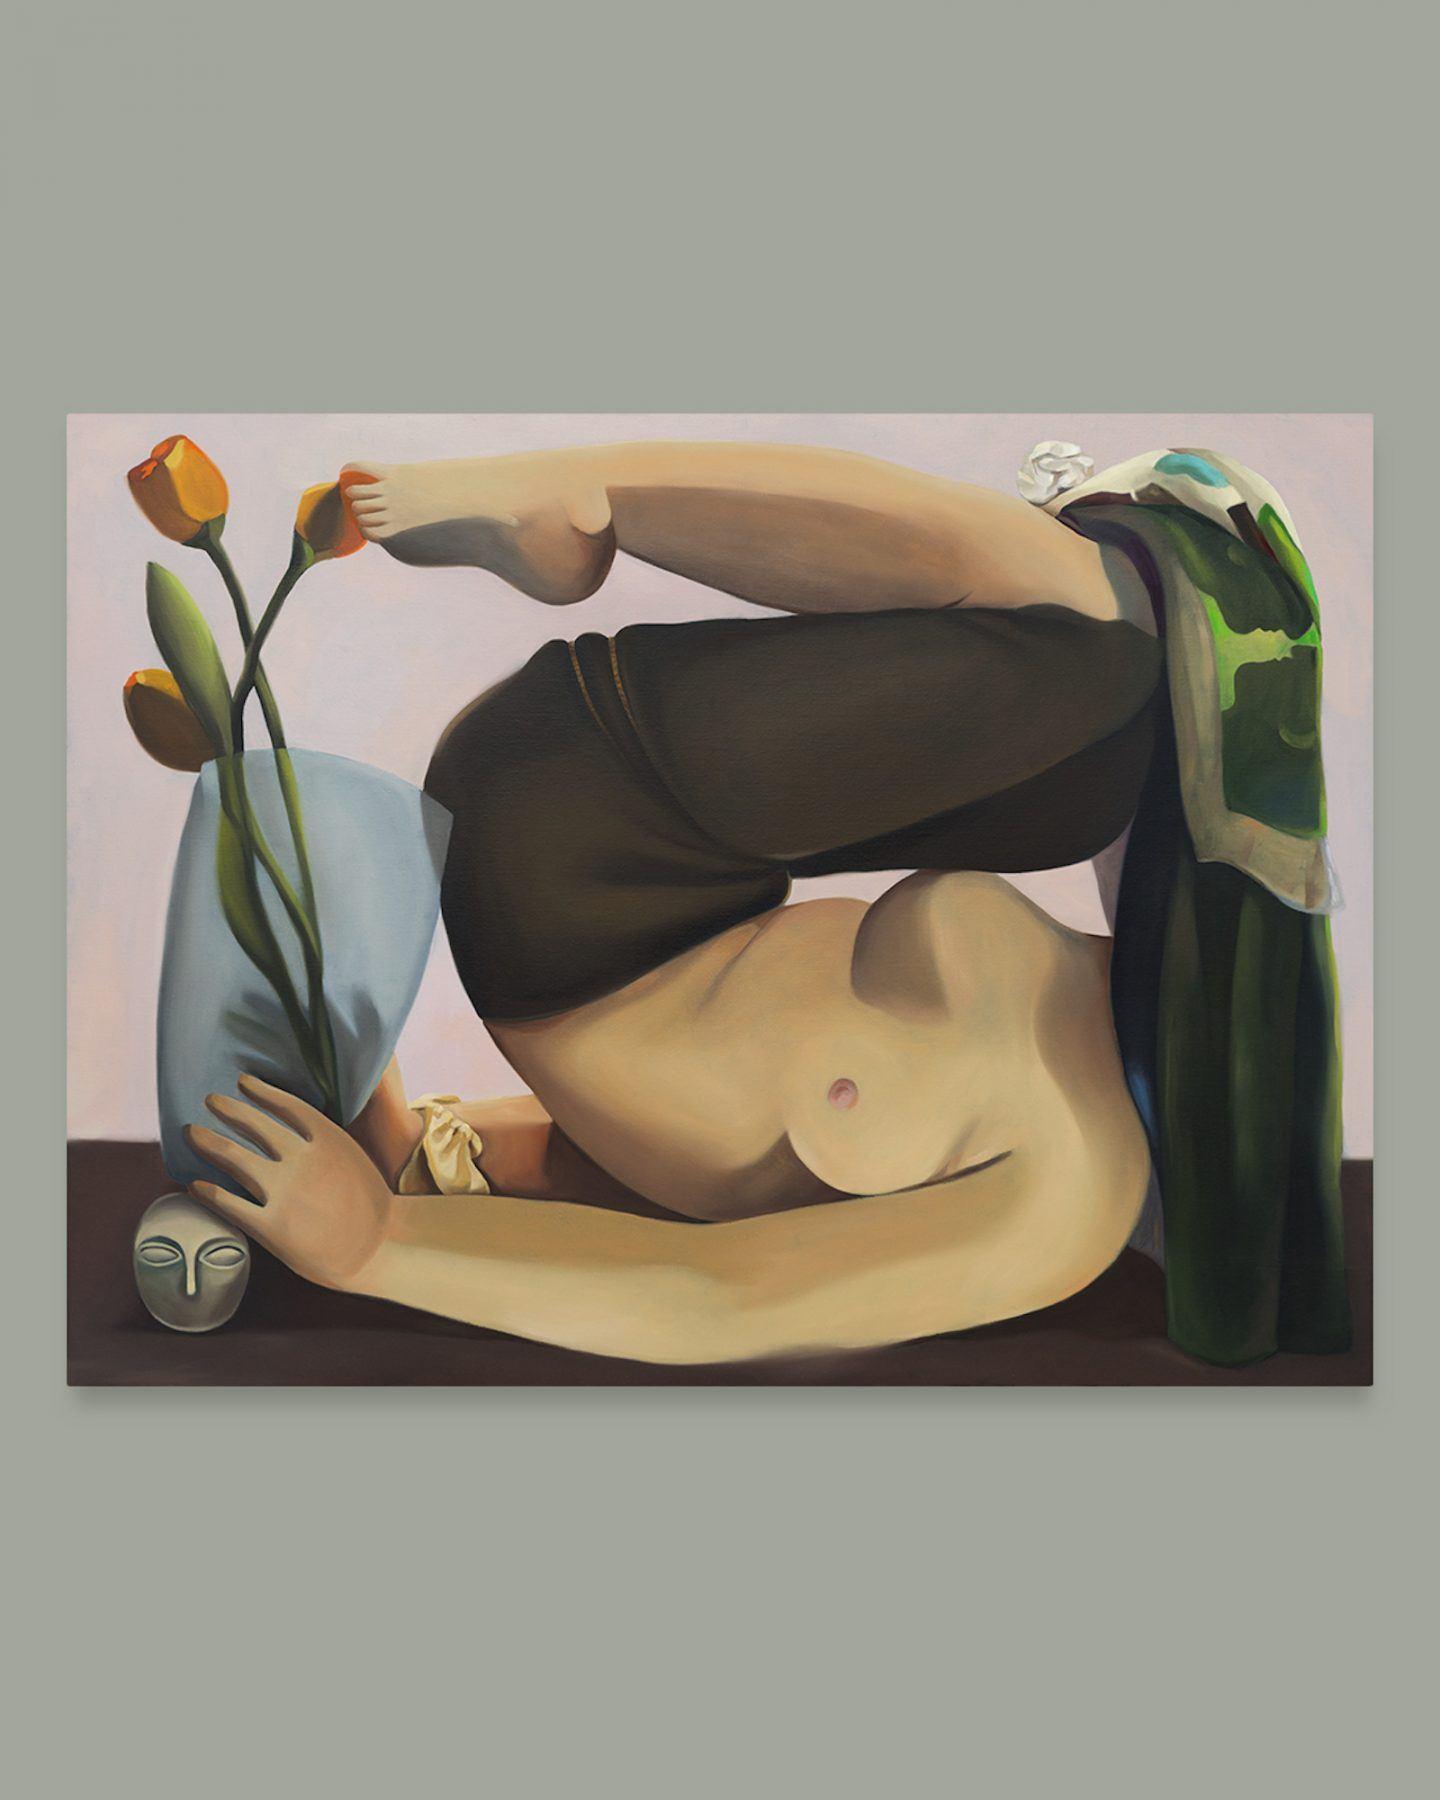 IGNANT-Art-Diane-Dal-Pra-Original-04